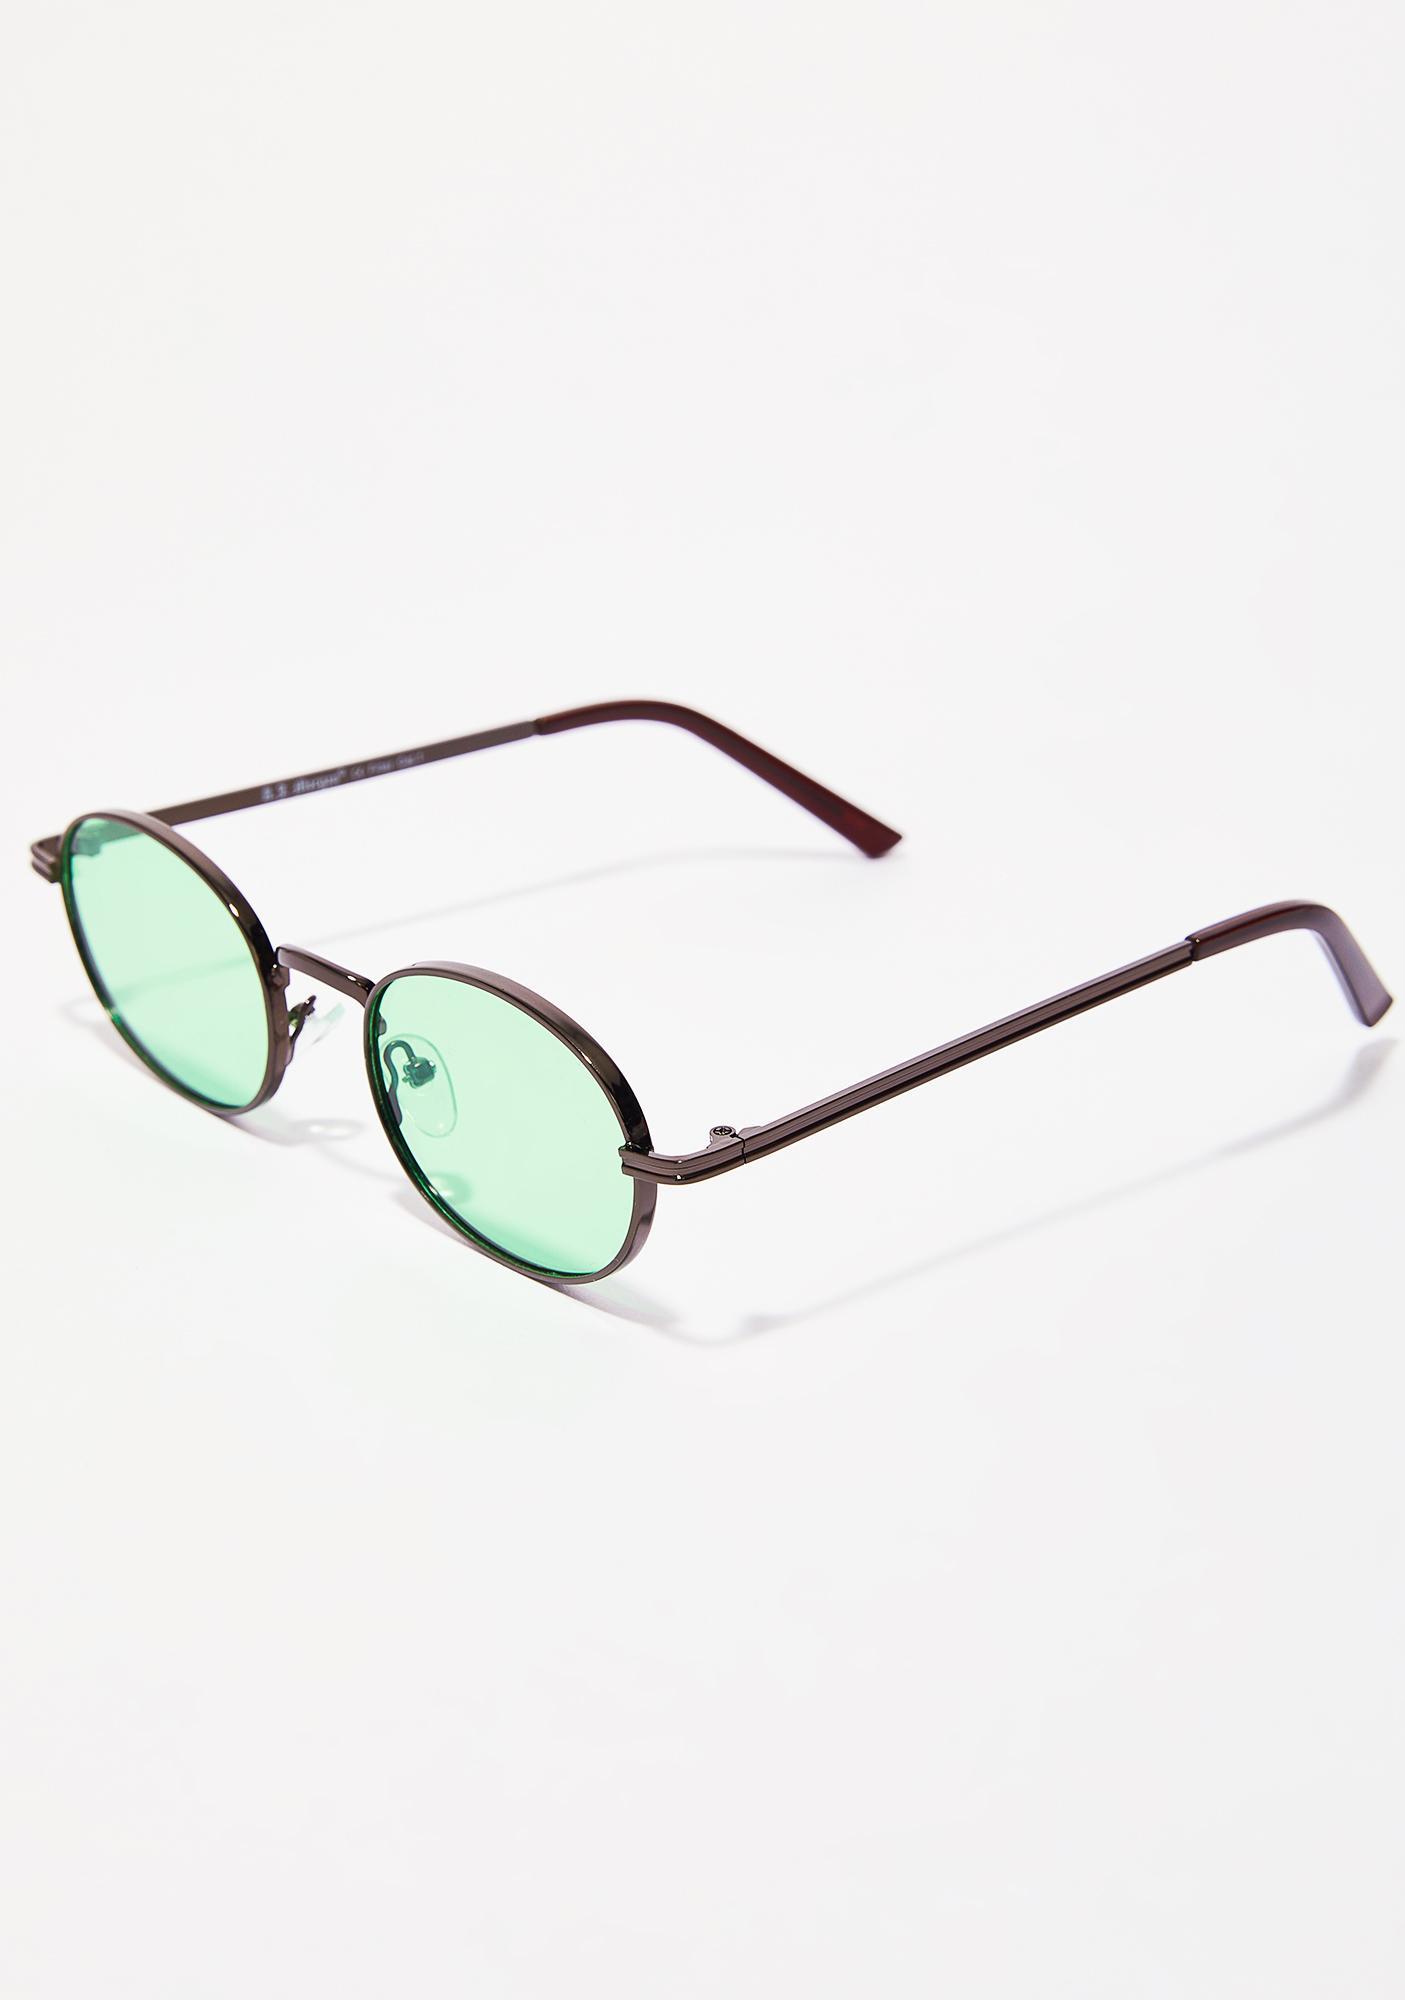 Boy Bye Oval Sunglasses